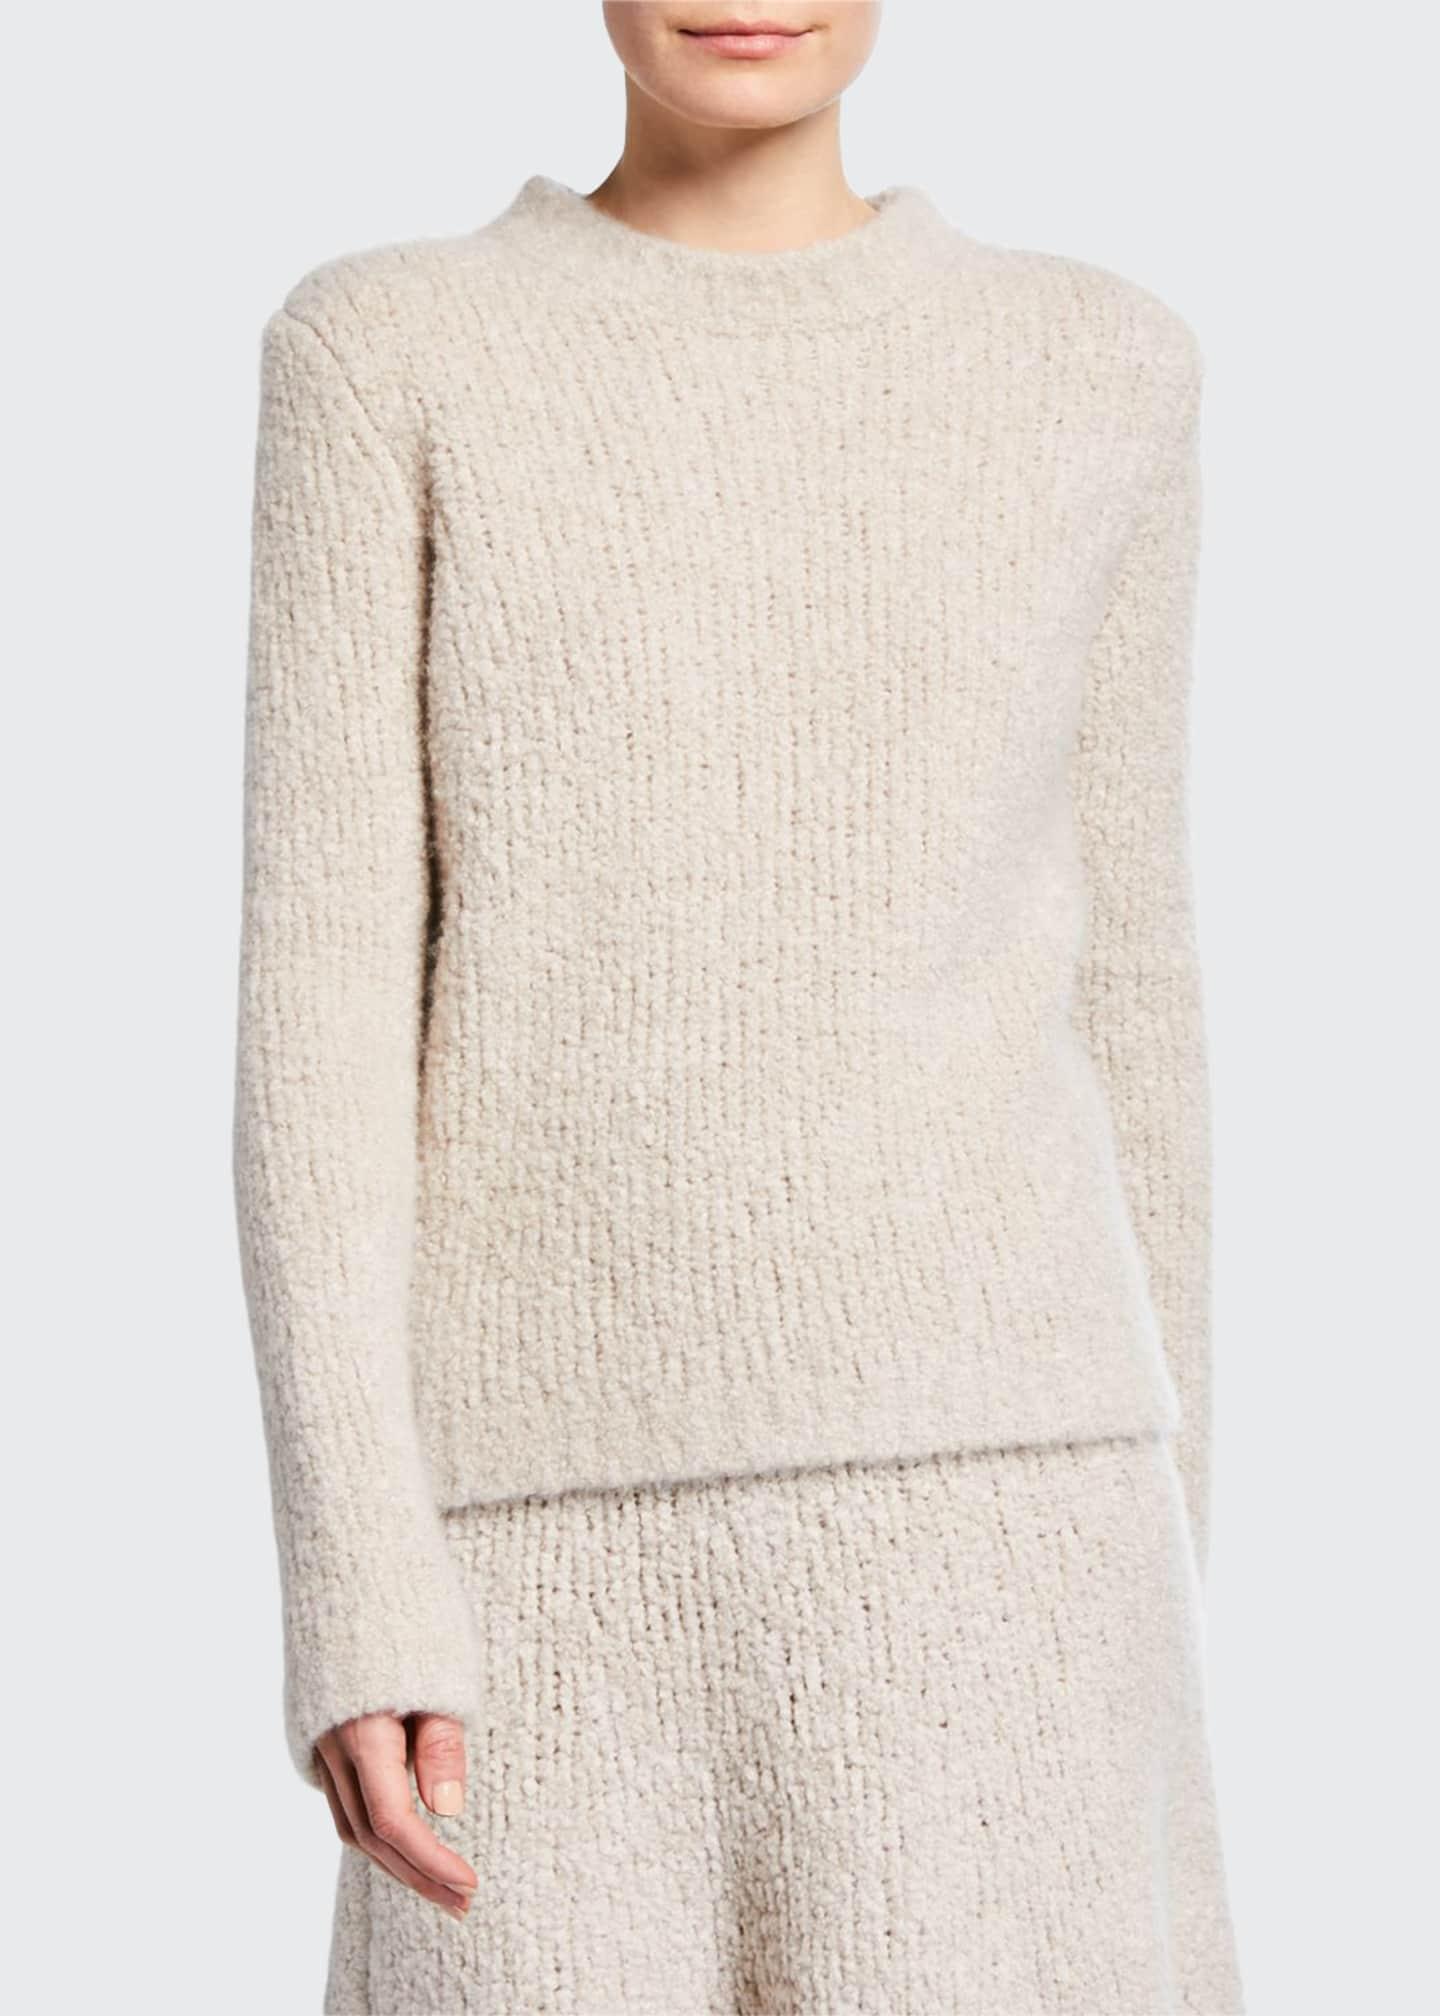 Gabriela Hearst Philippe Crewneck Cashmere Boucle Sweater